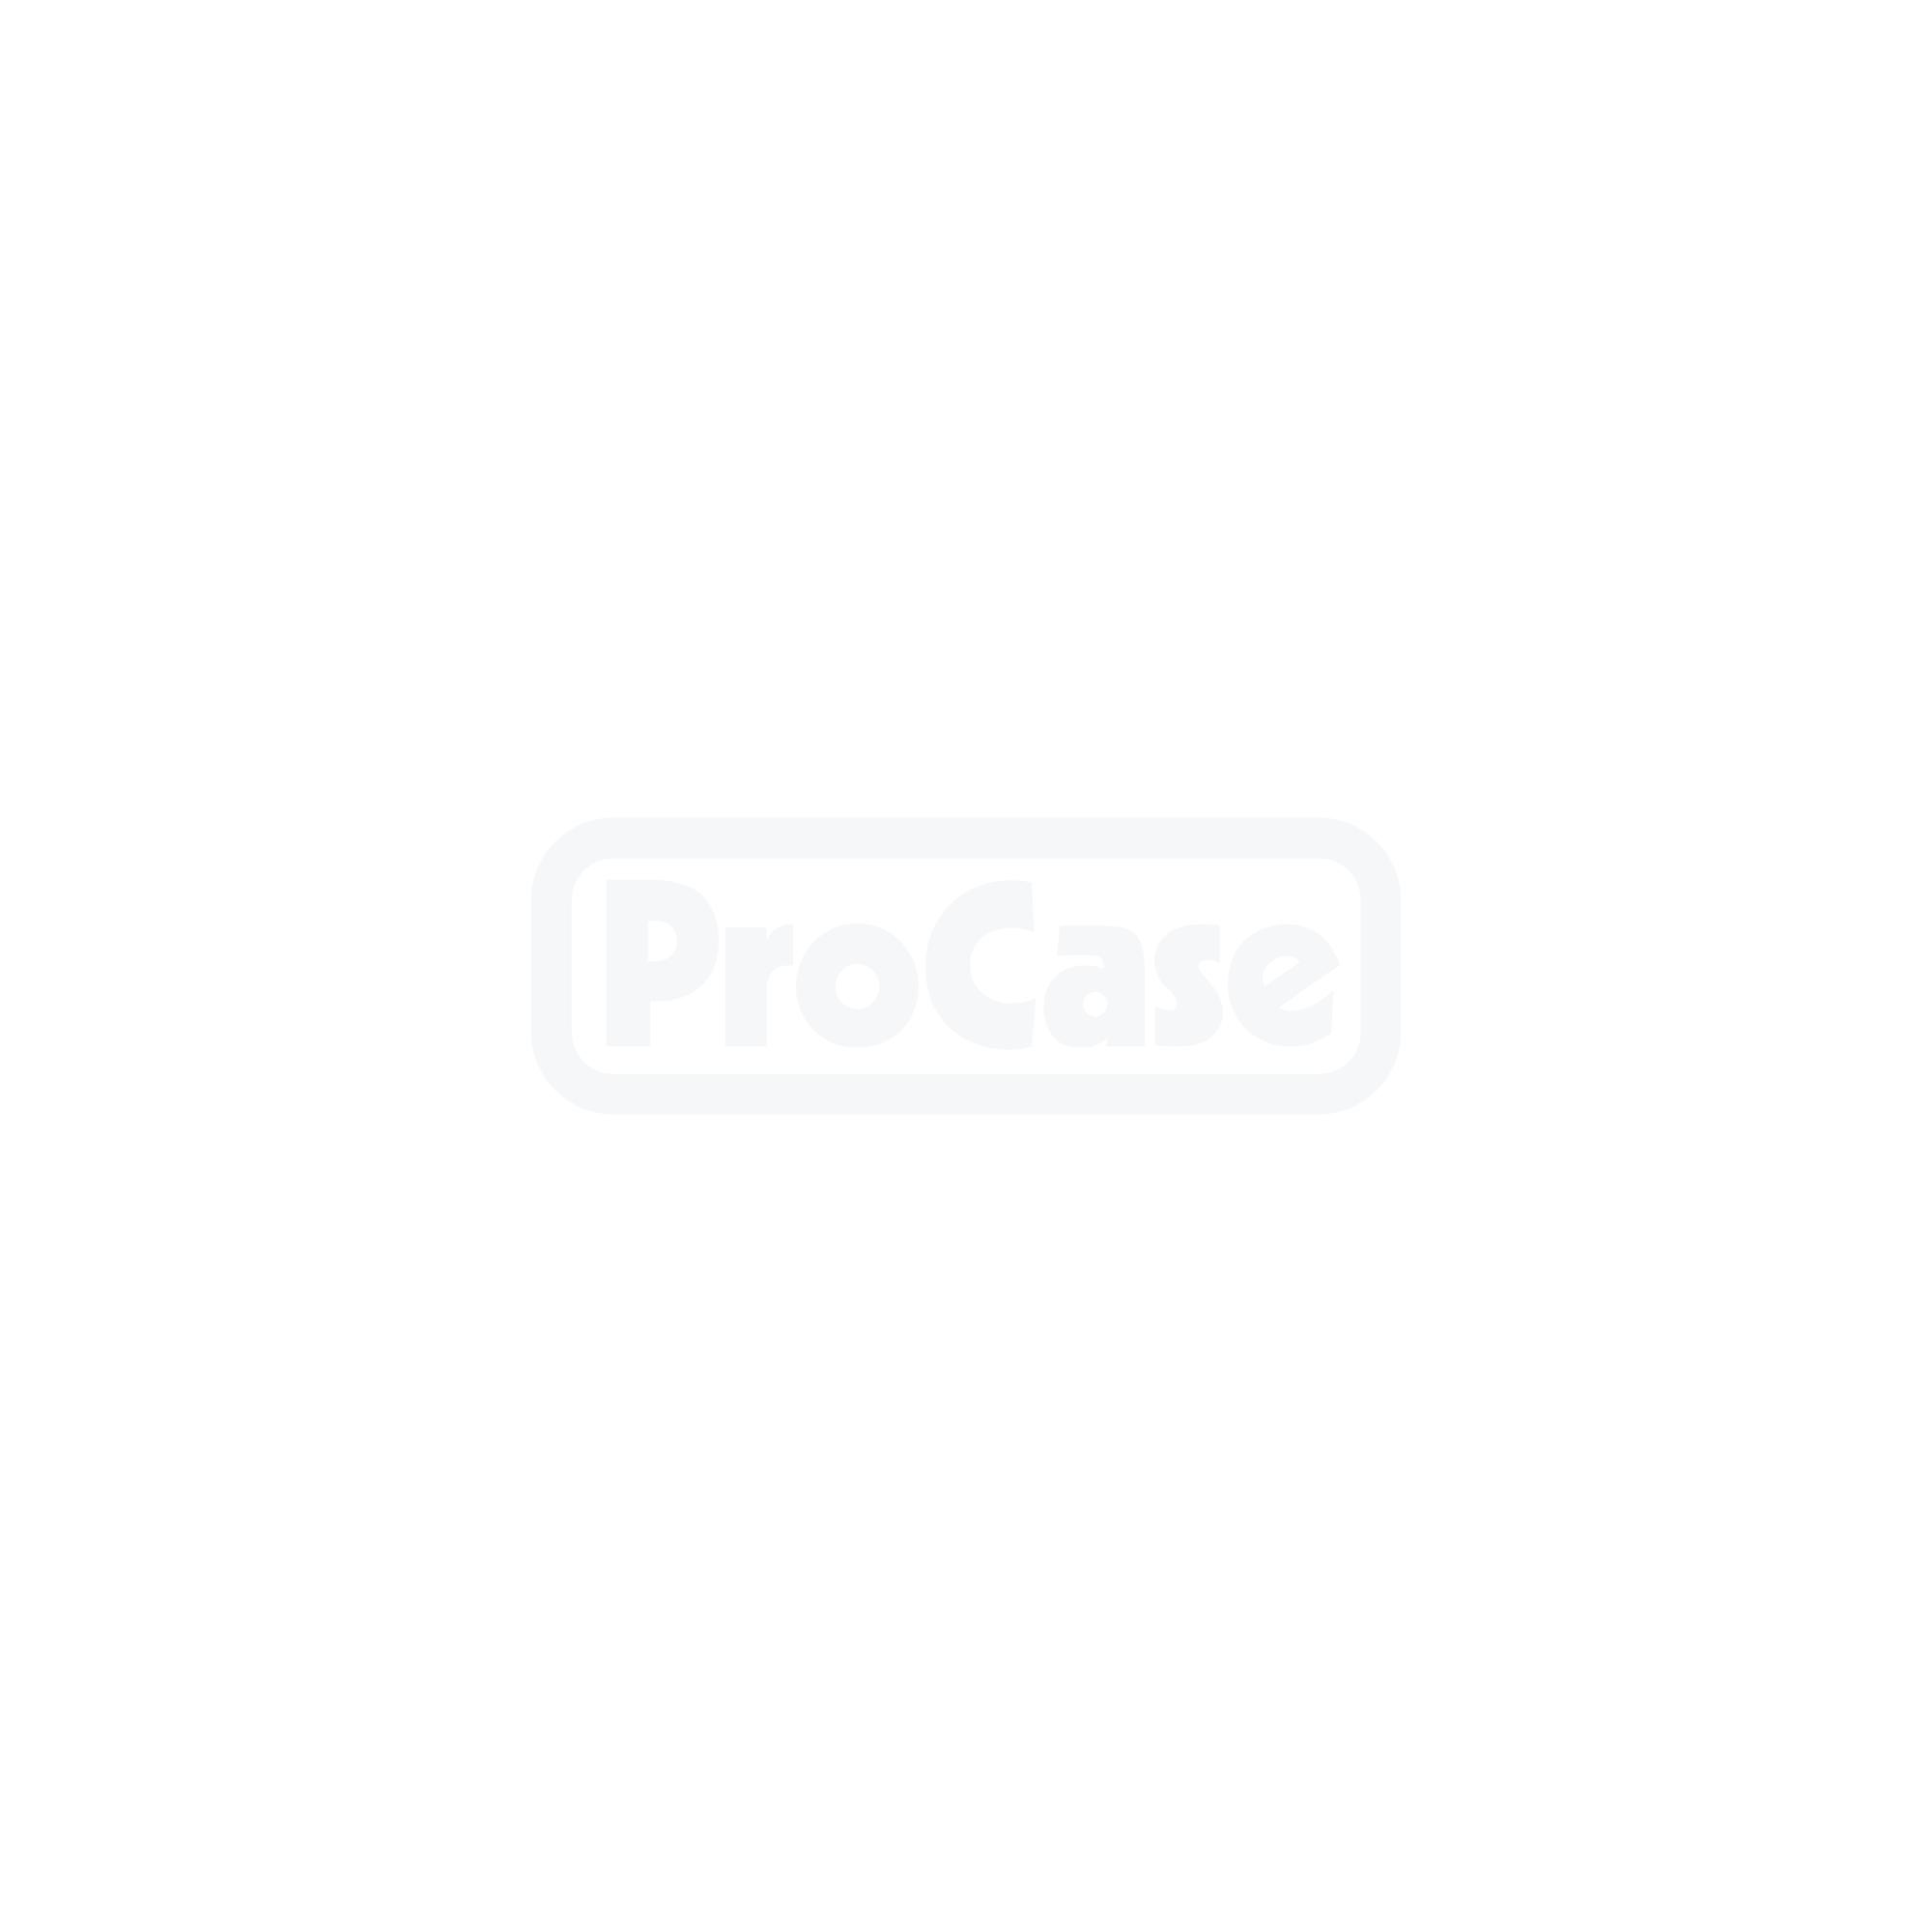 Flightcase für Beamer Optik variabel 2